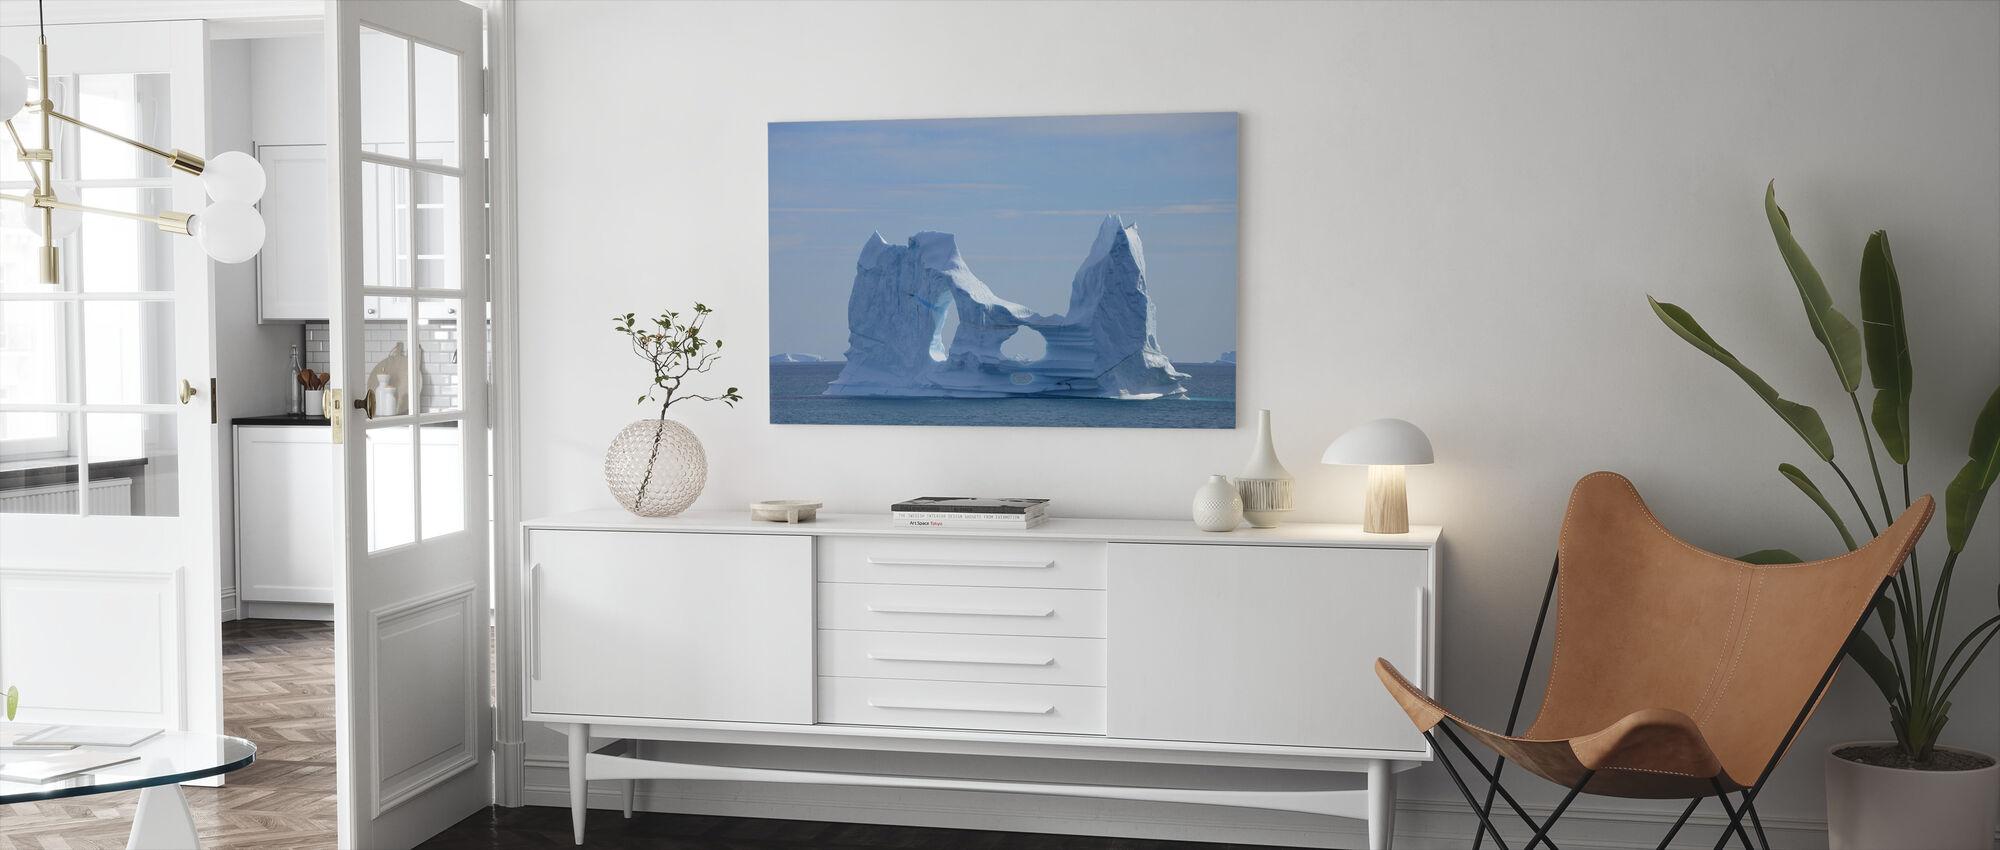 Kelluva Grönlanti - Canvastaulu - Olohuone